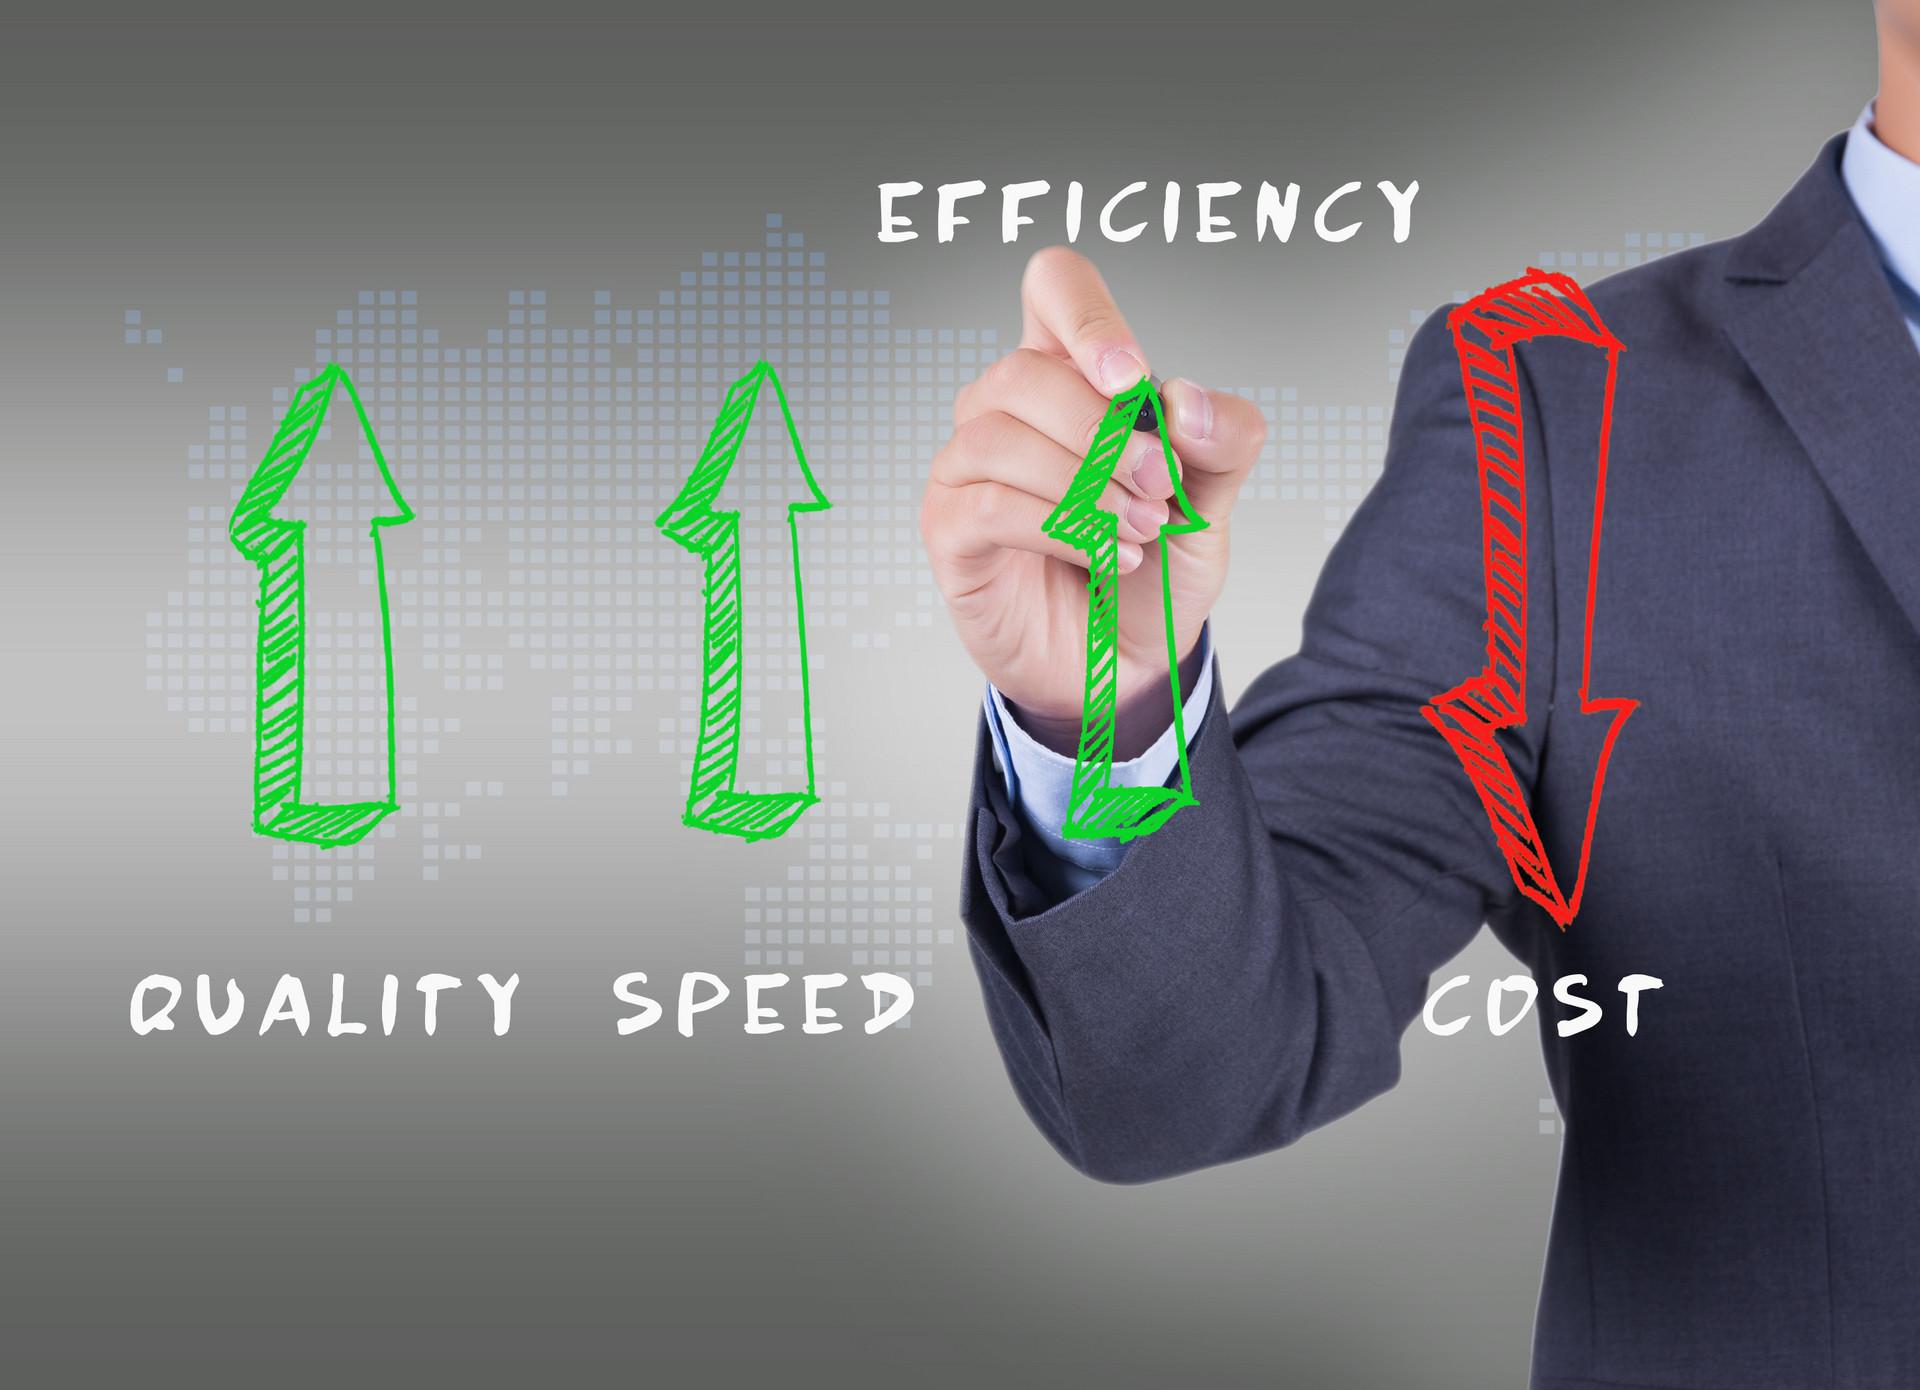 SCARA机器人技术与应用,让生产节约成本和时间